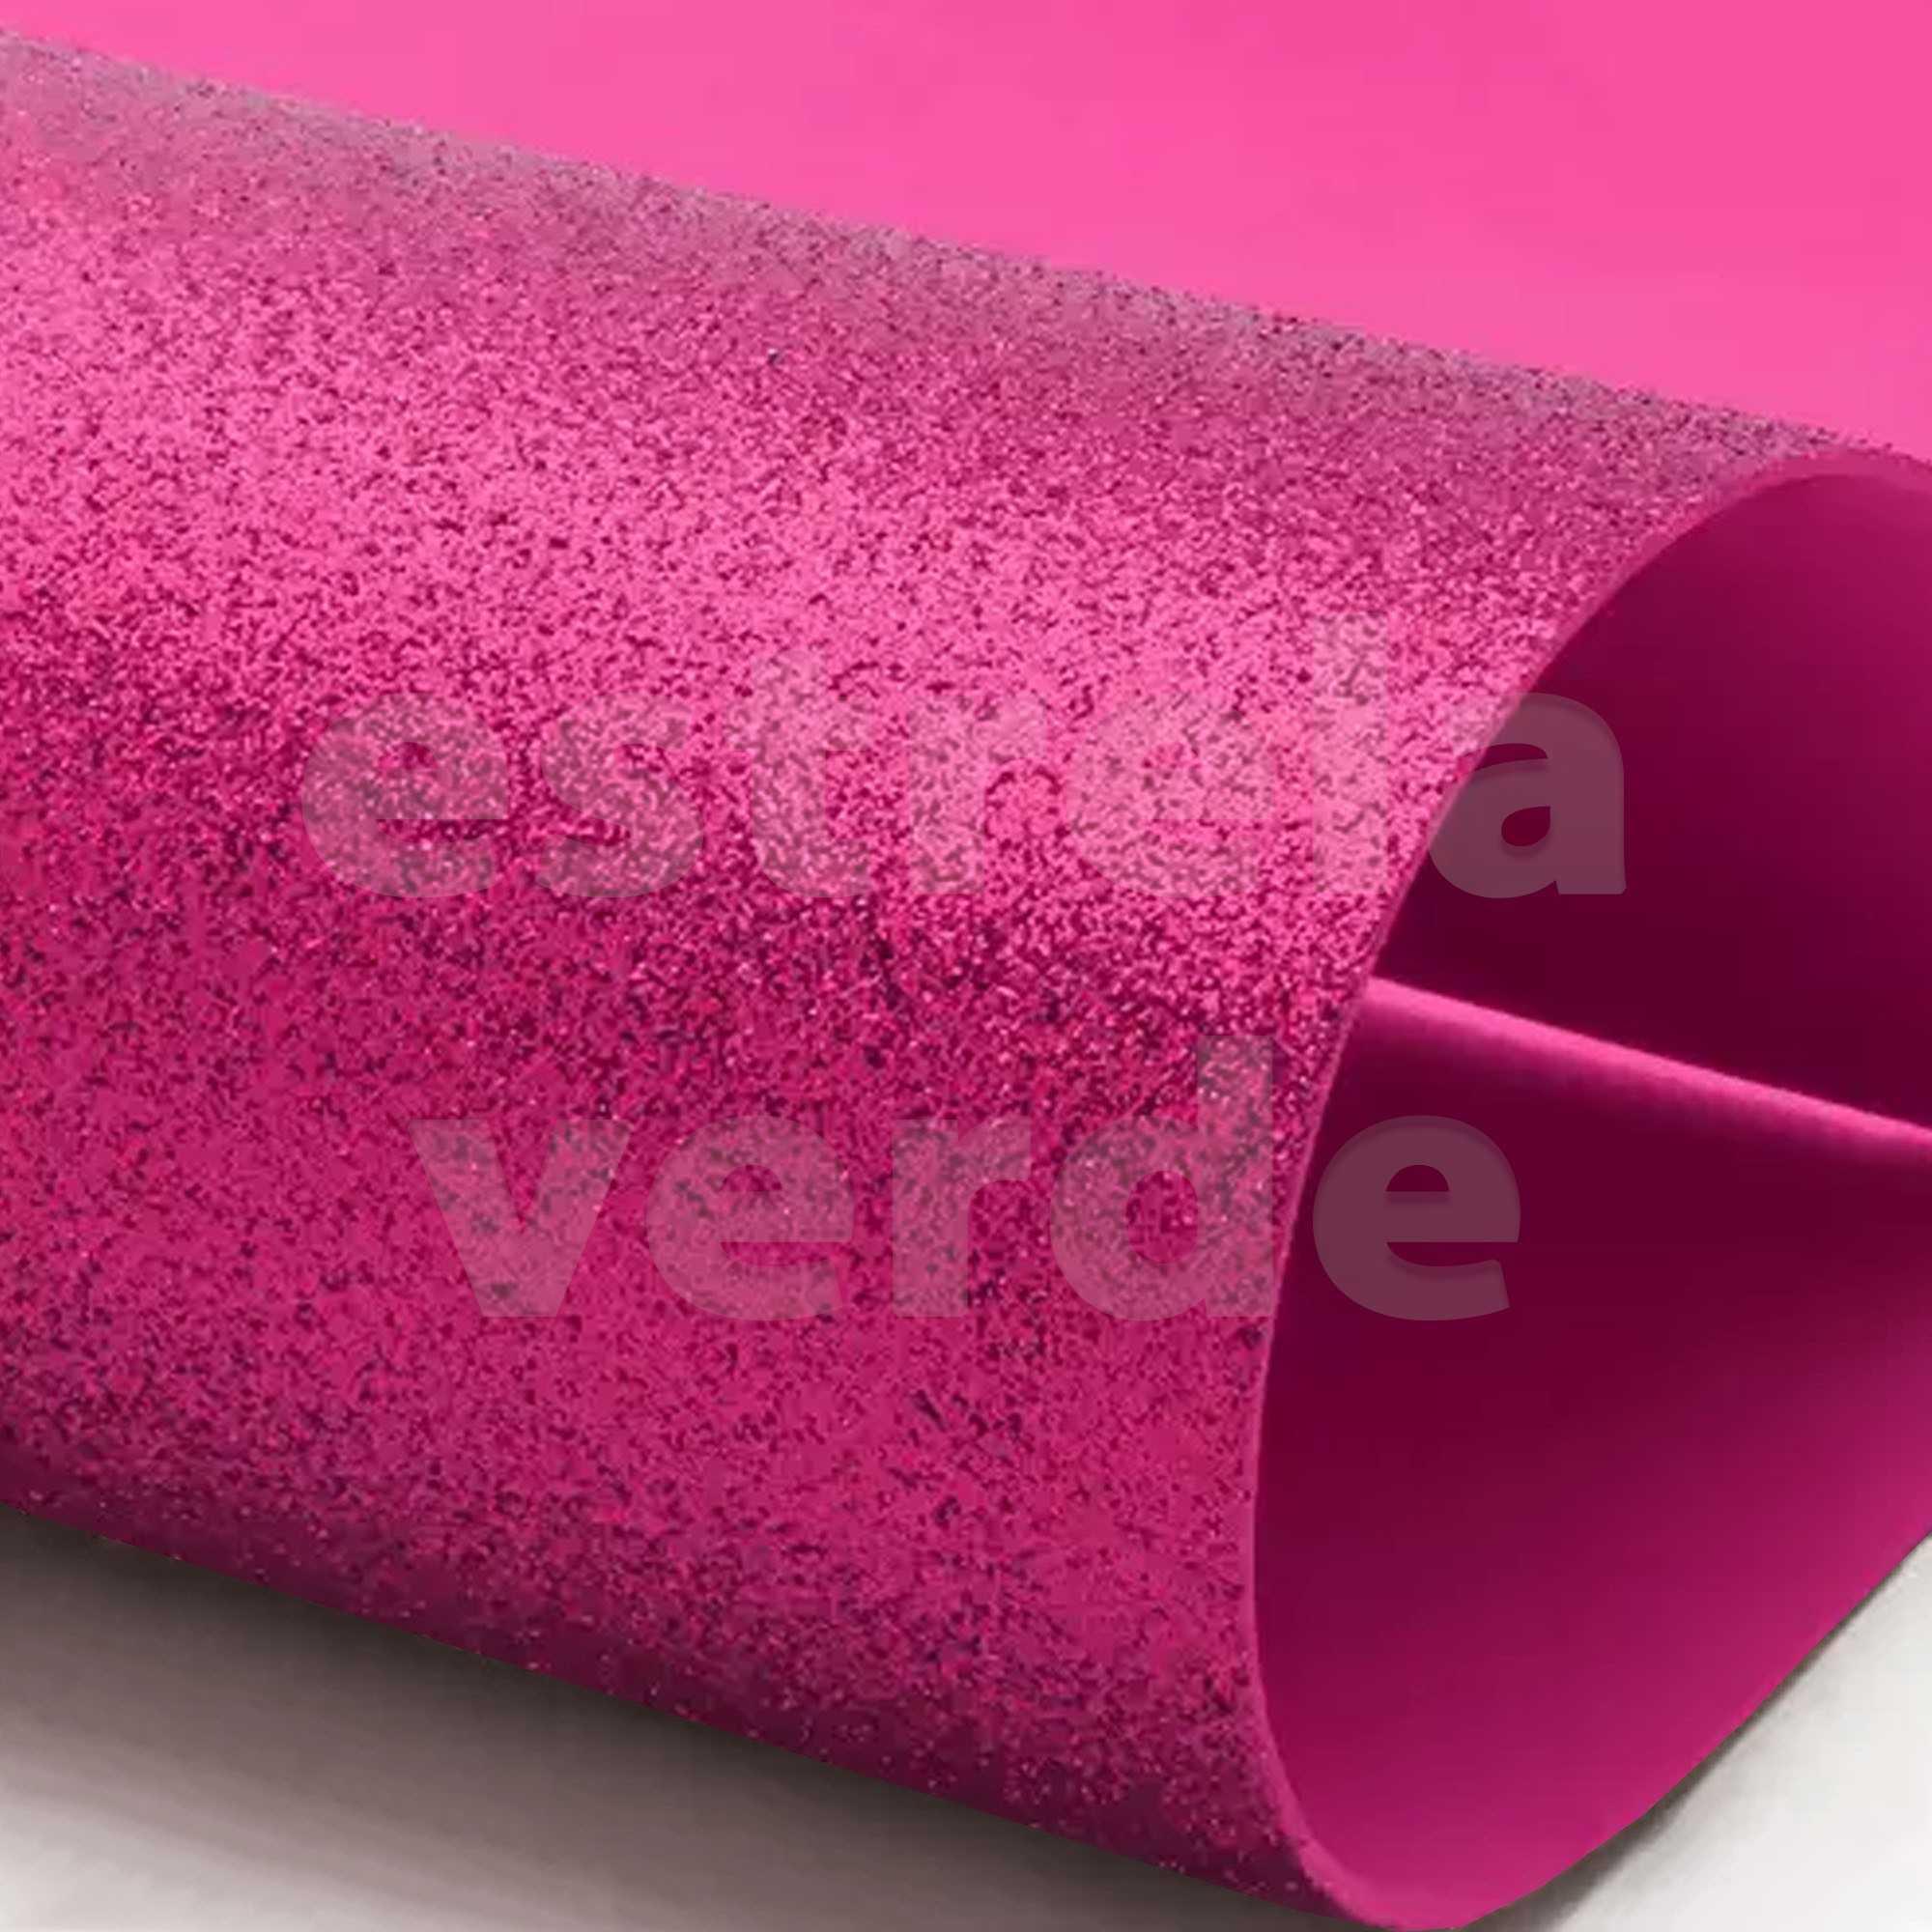 EVA GLITTER 40X60 ROSA PINK 2MM  - Estrela Verde